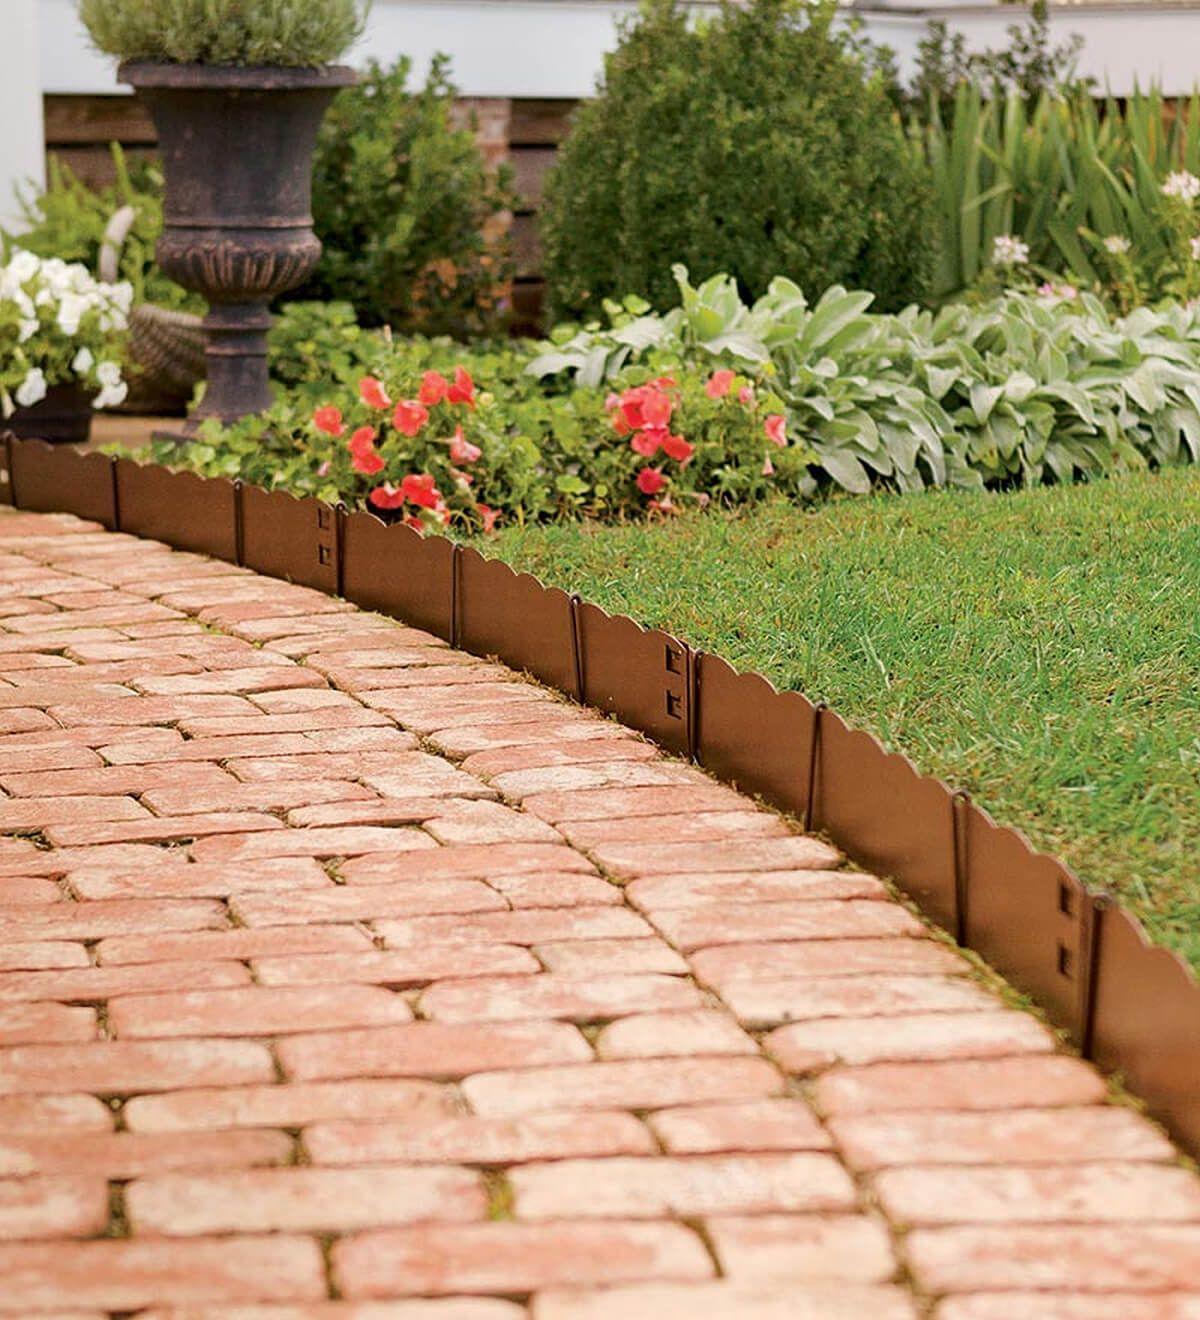 Elegant backyard landscaping ideas using bricks 06